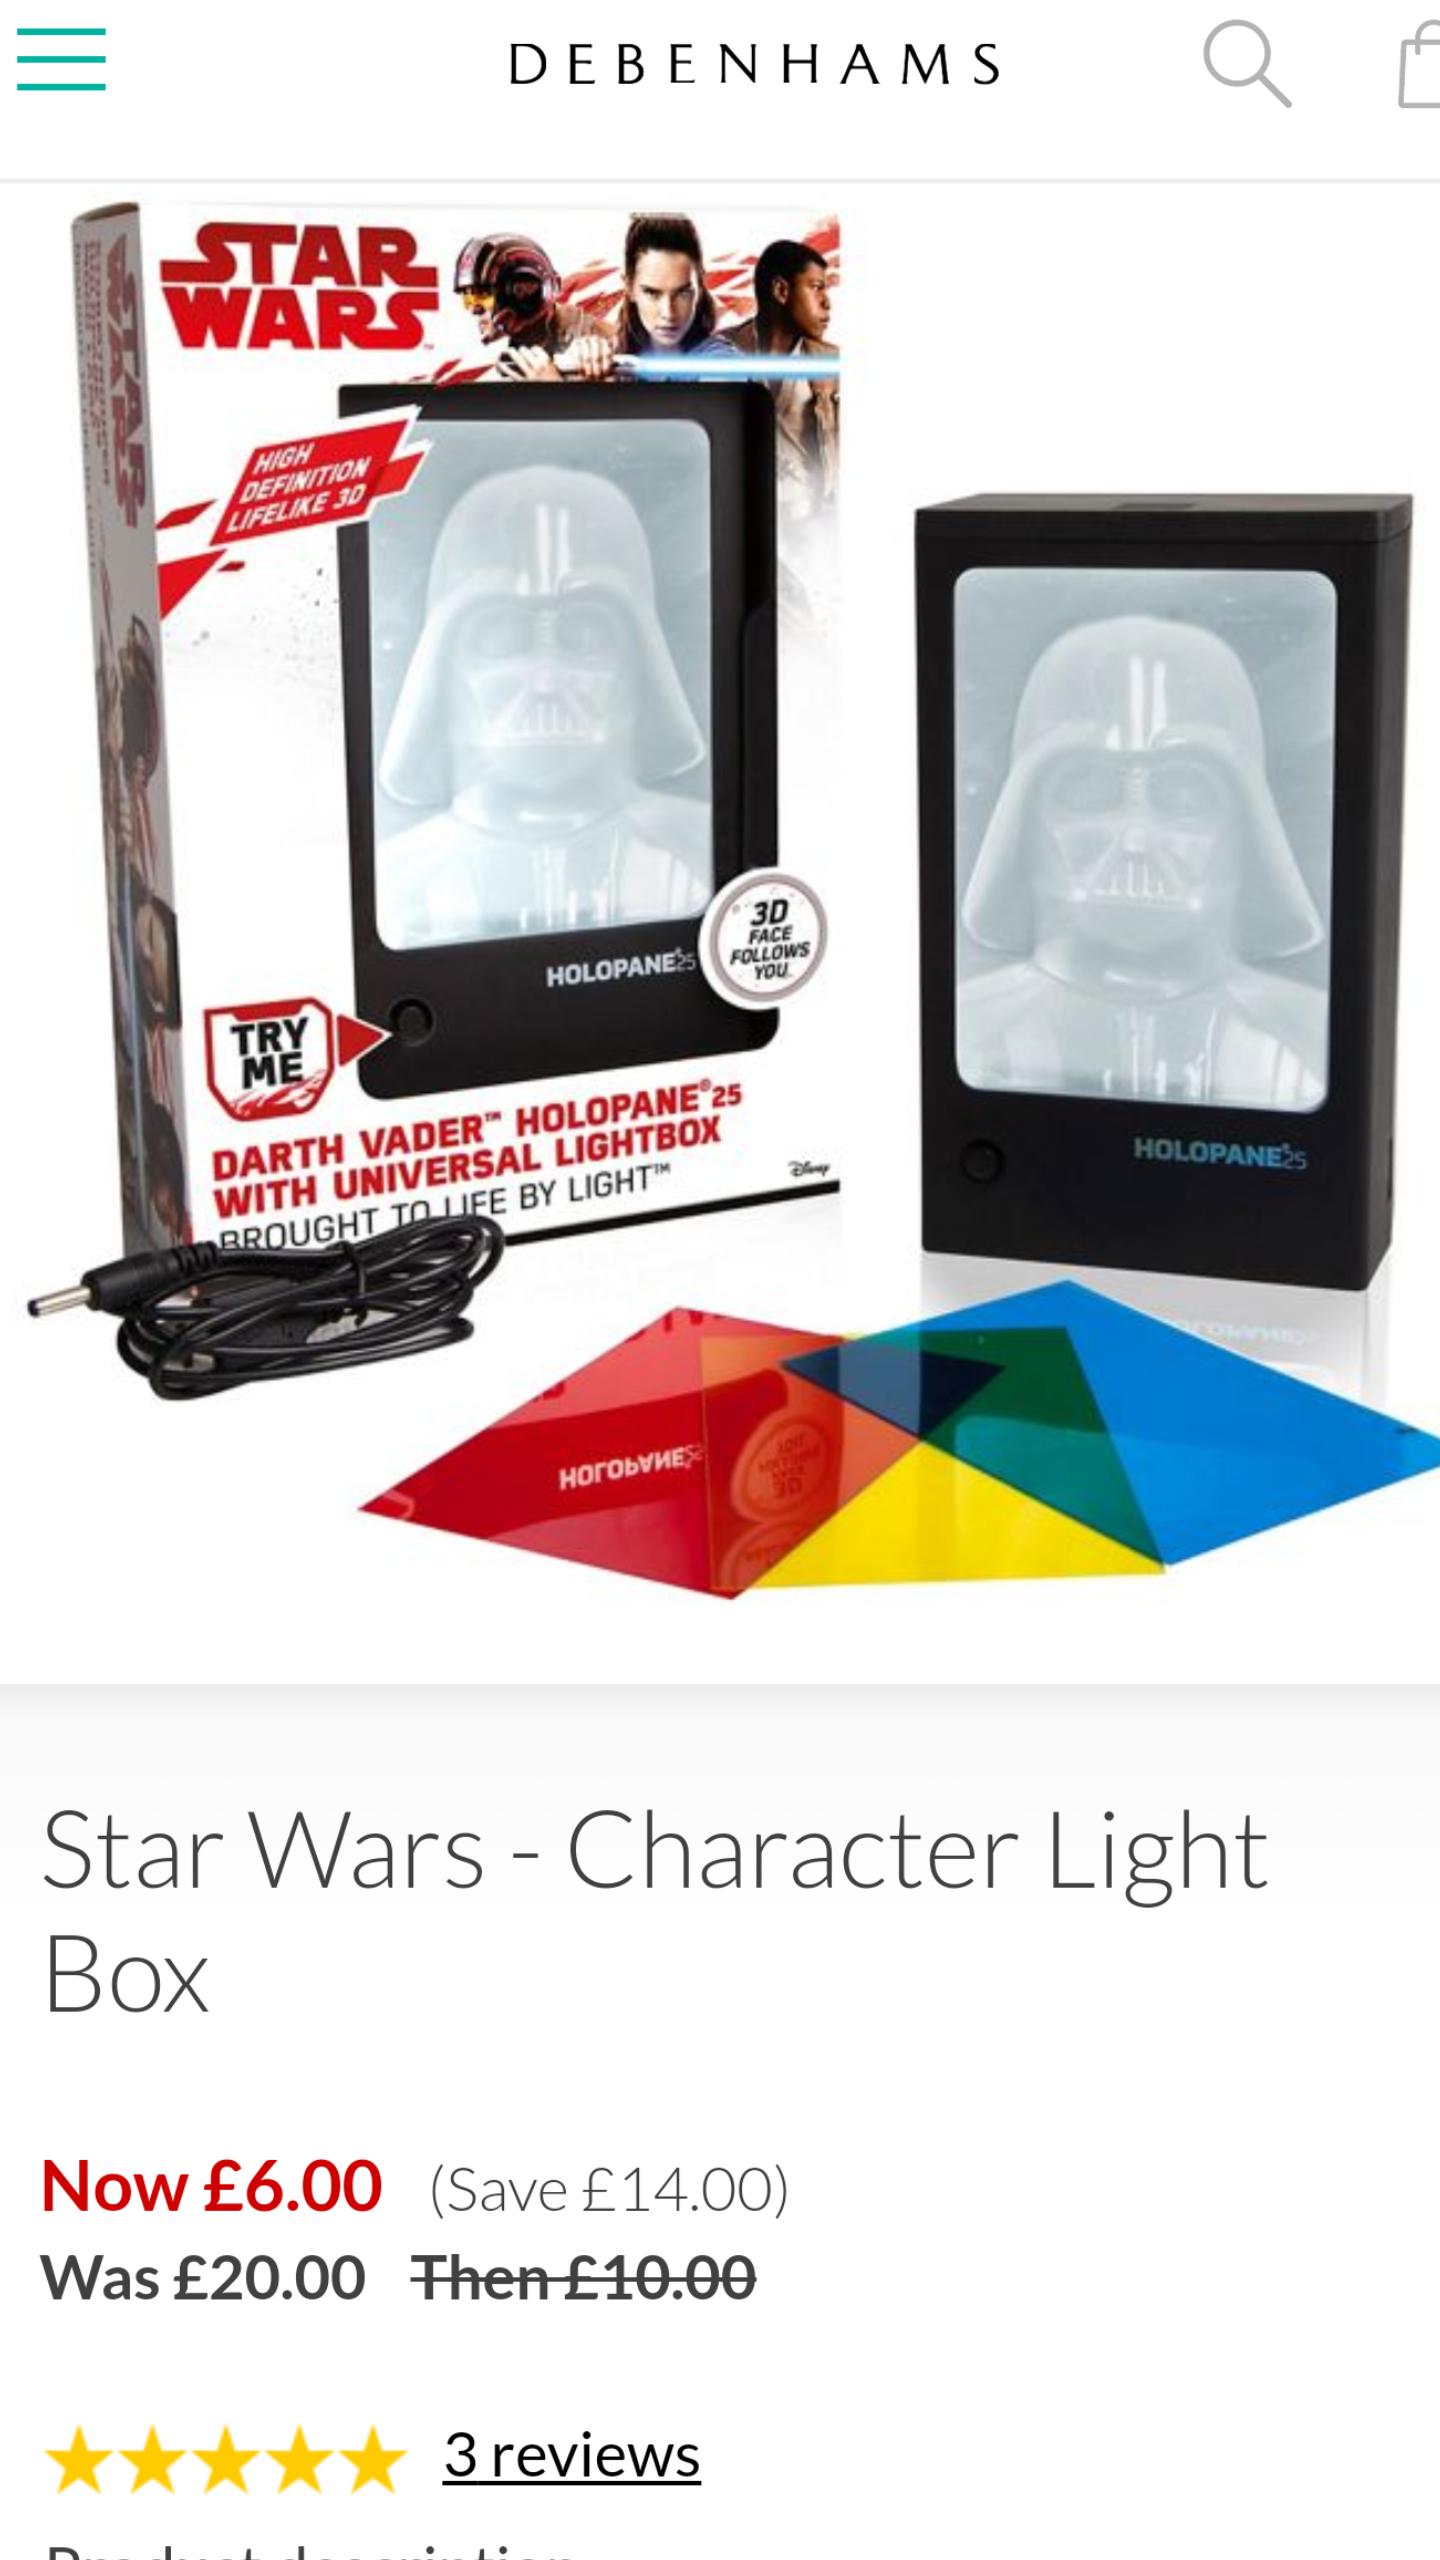 Star Wars-Character Light Box - Debenhams £6 Del w/code